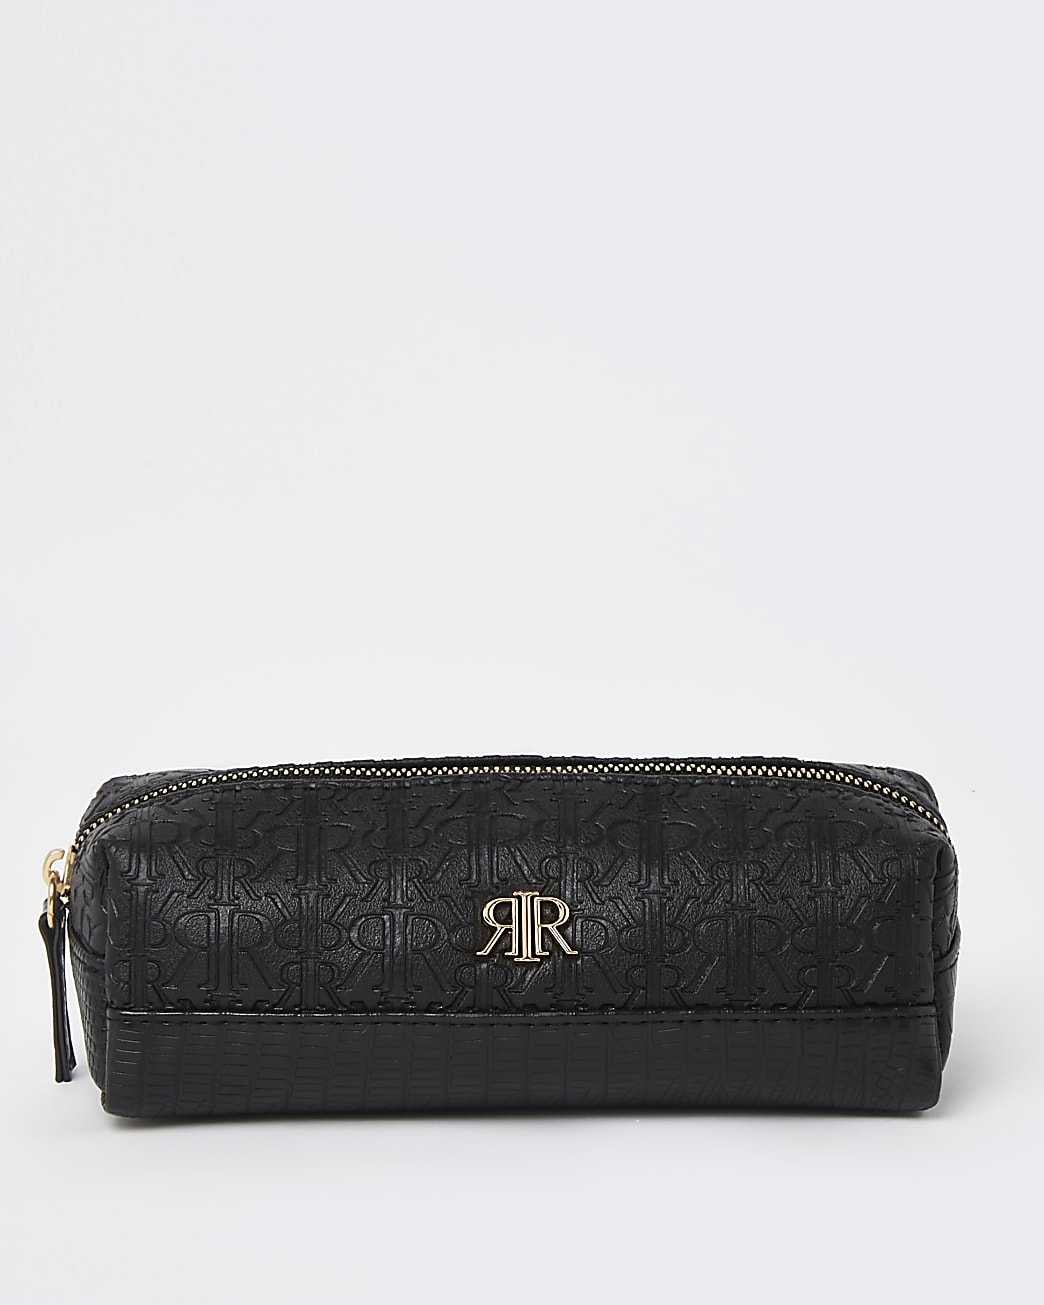 Girls black RR embossed pencil case